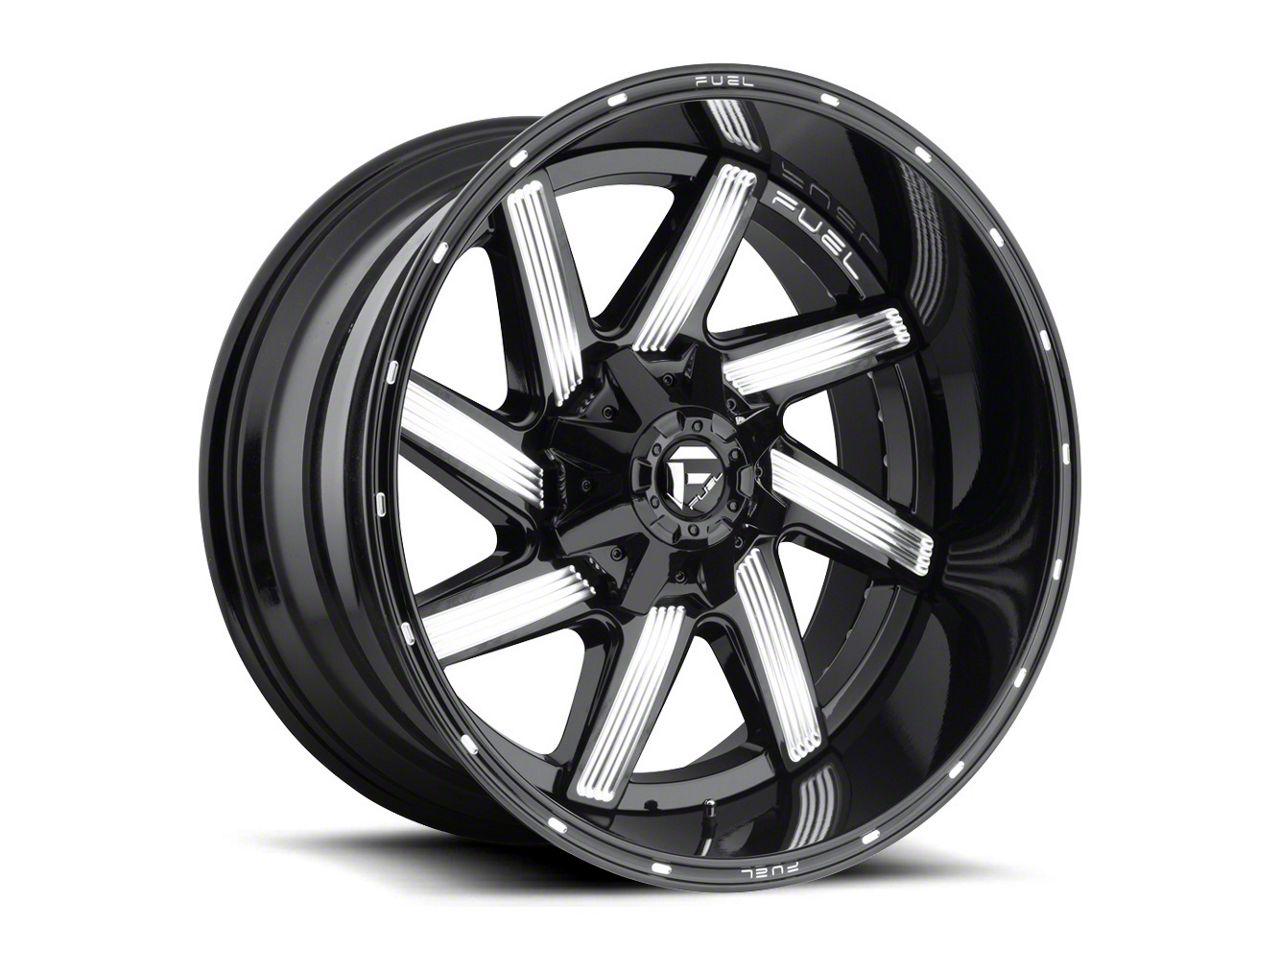 Fuel Wheels Moab Gloss Black Milled 6-Lug Wheel - 22x14 (07-18 Sierra 1500)